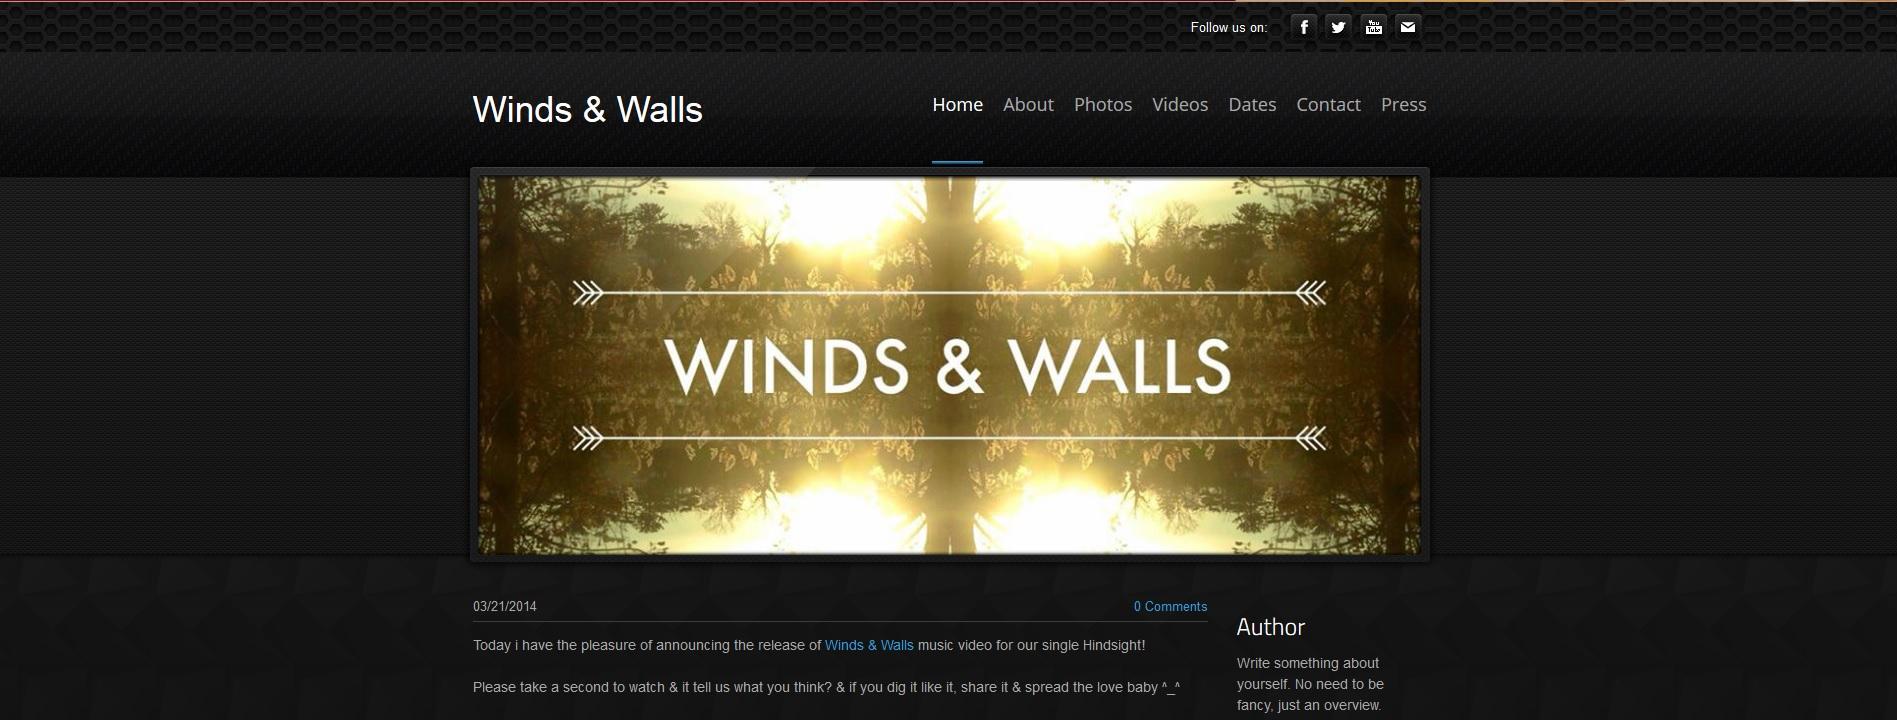 WindsandWalls.jpg